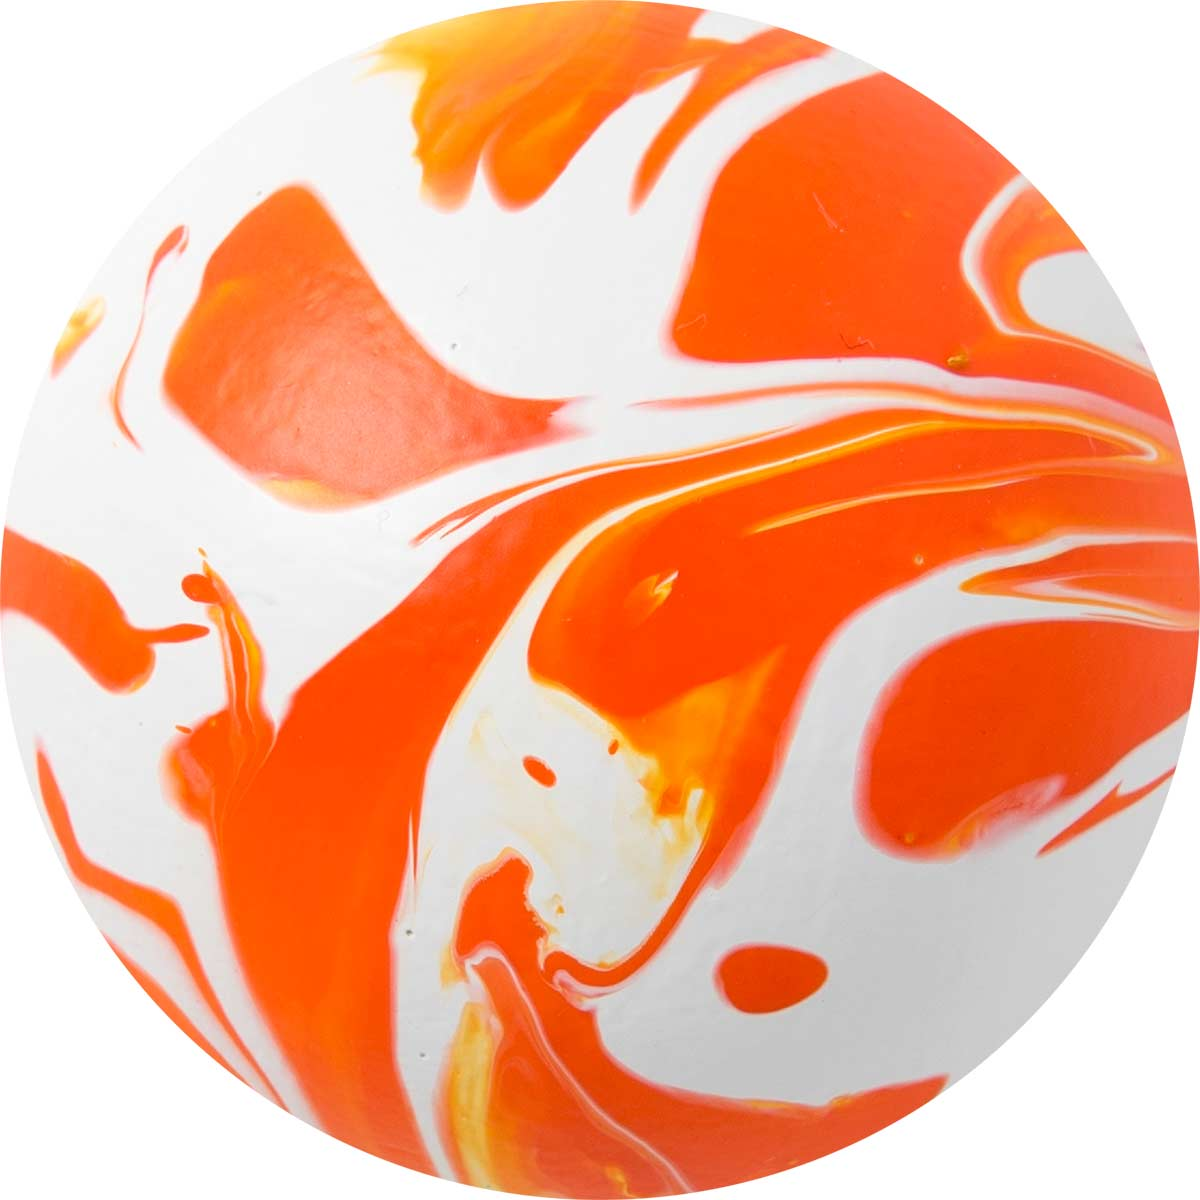 FolkArt ® Marbling Paint - Orange, 2 oz.